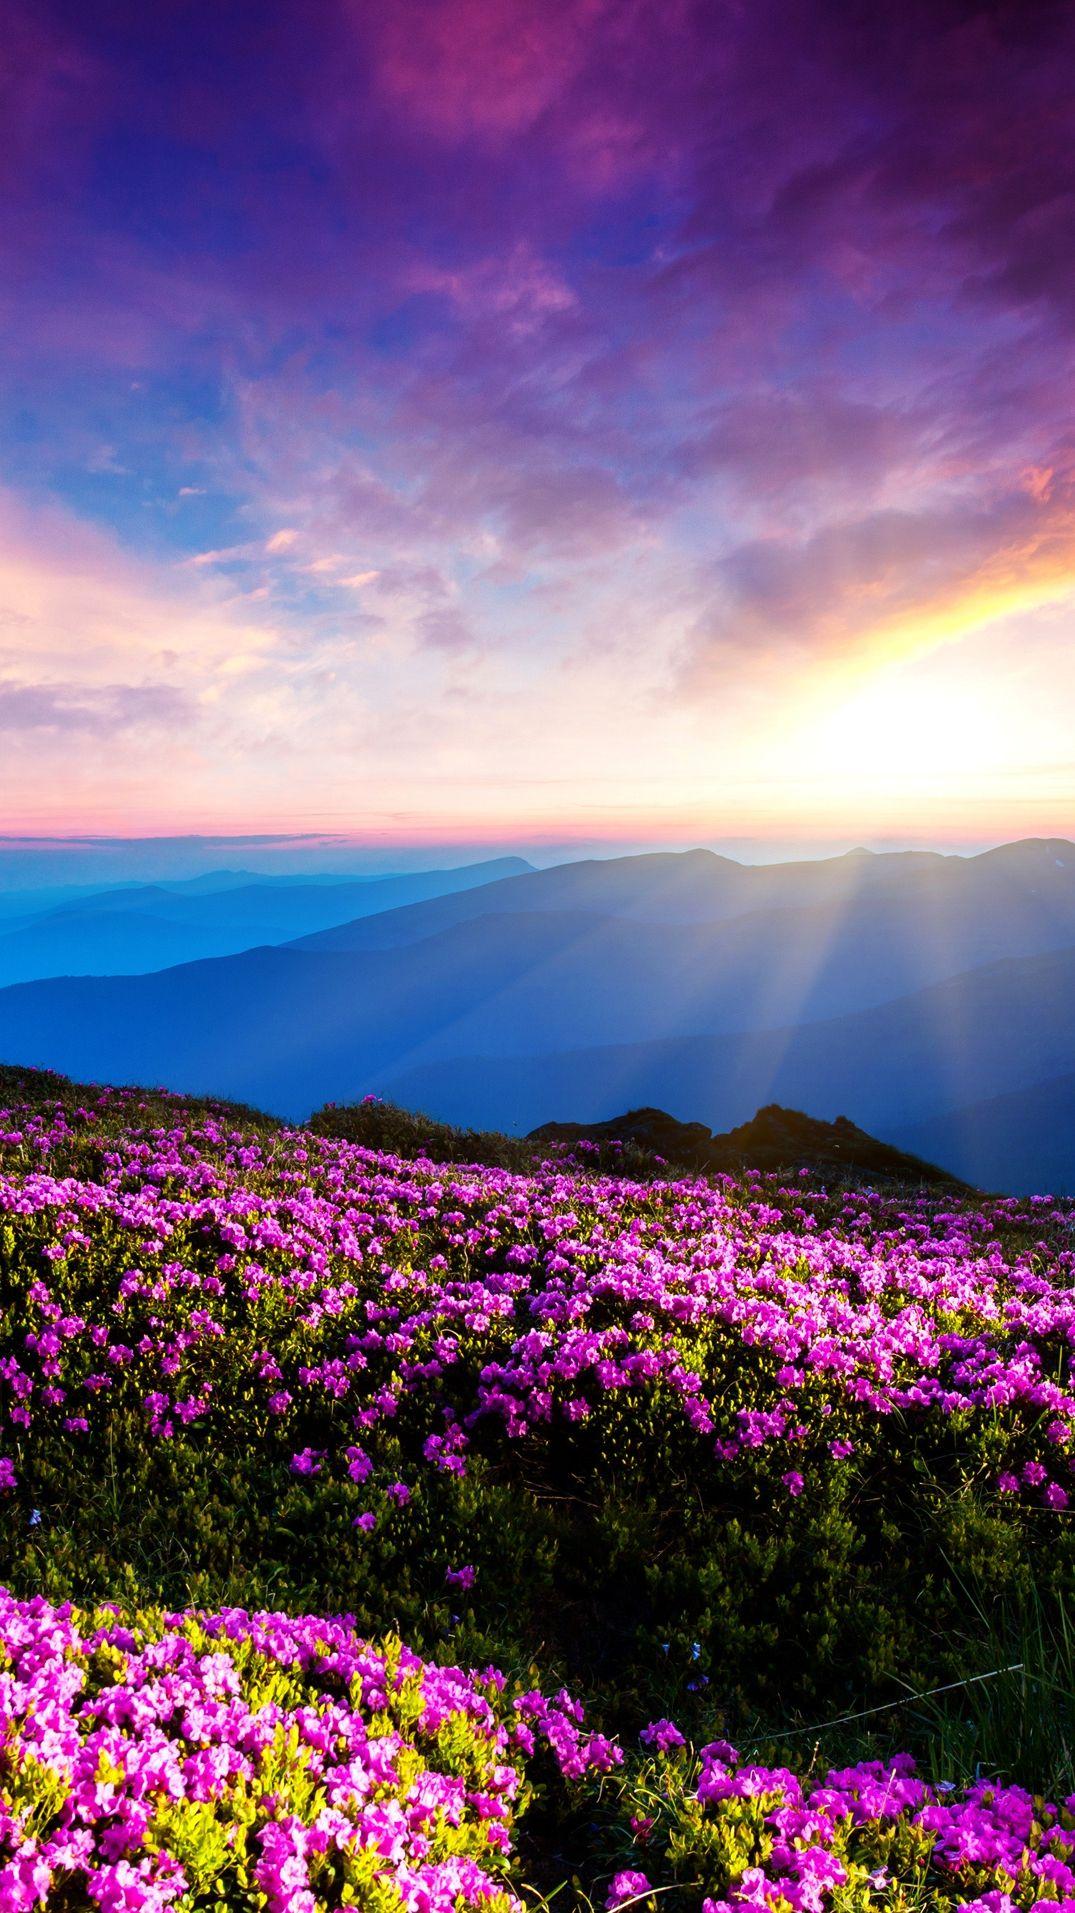 Amazing Wallpaper Mountain Flower - 6ecb091a25699e9f8243a5699eb8f5f7  Collection_988176.jpg